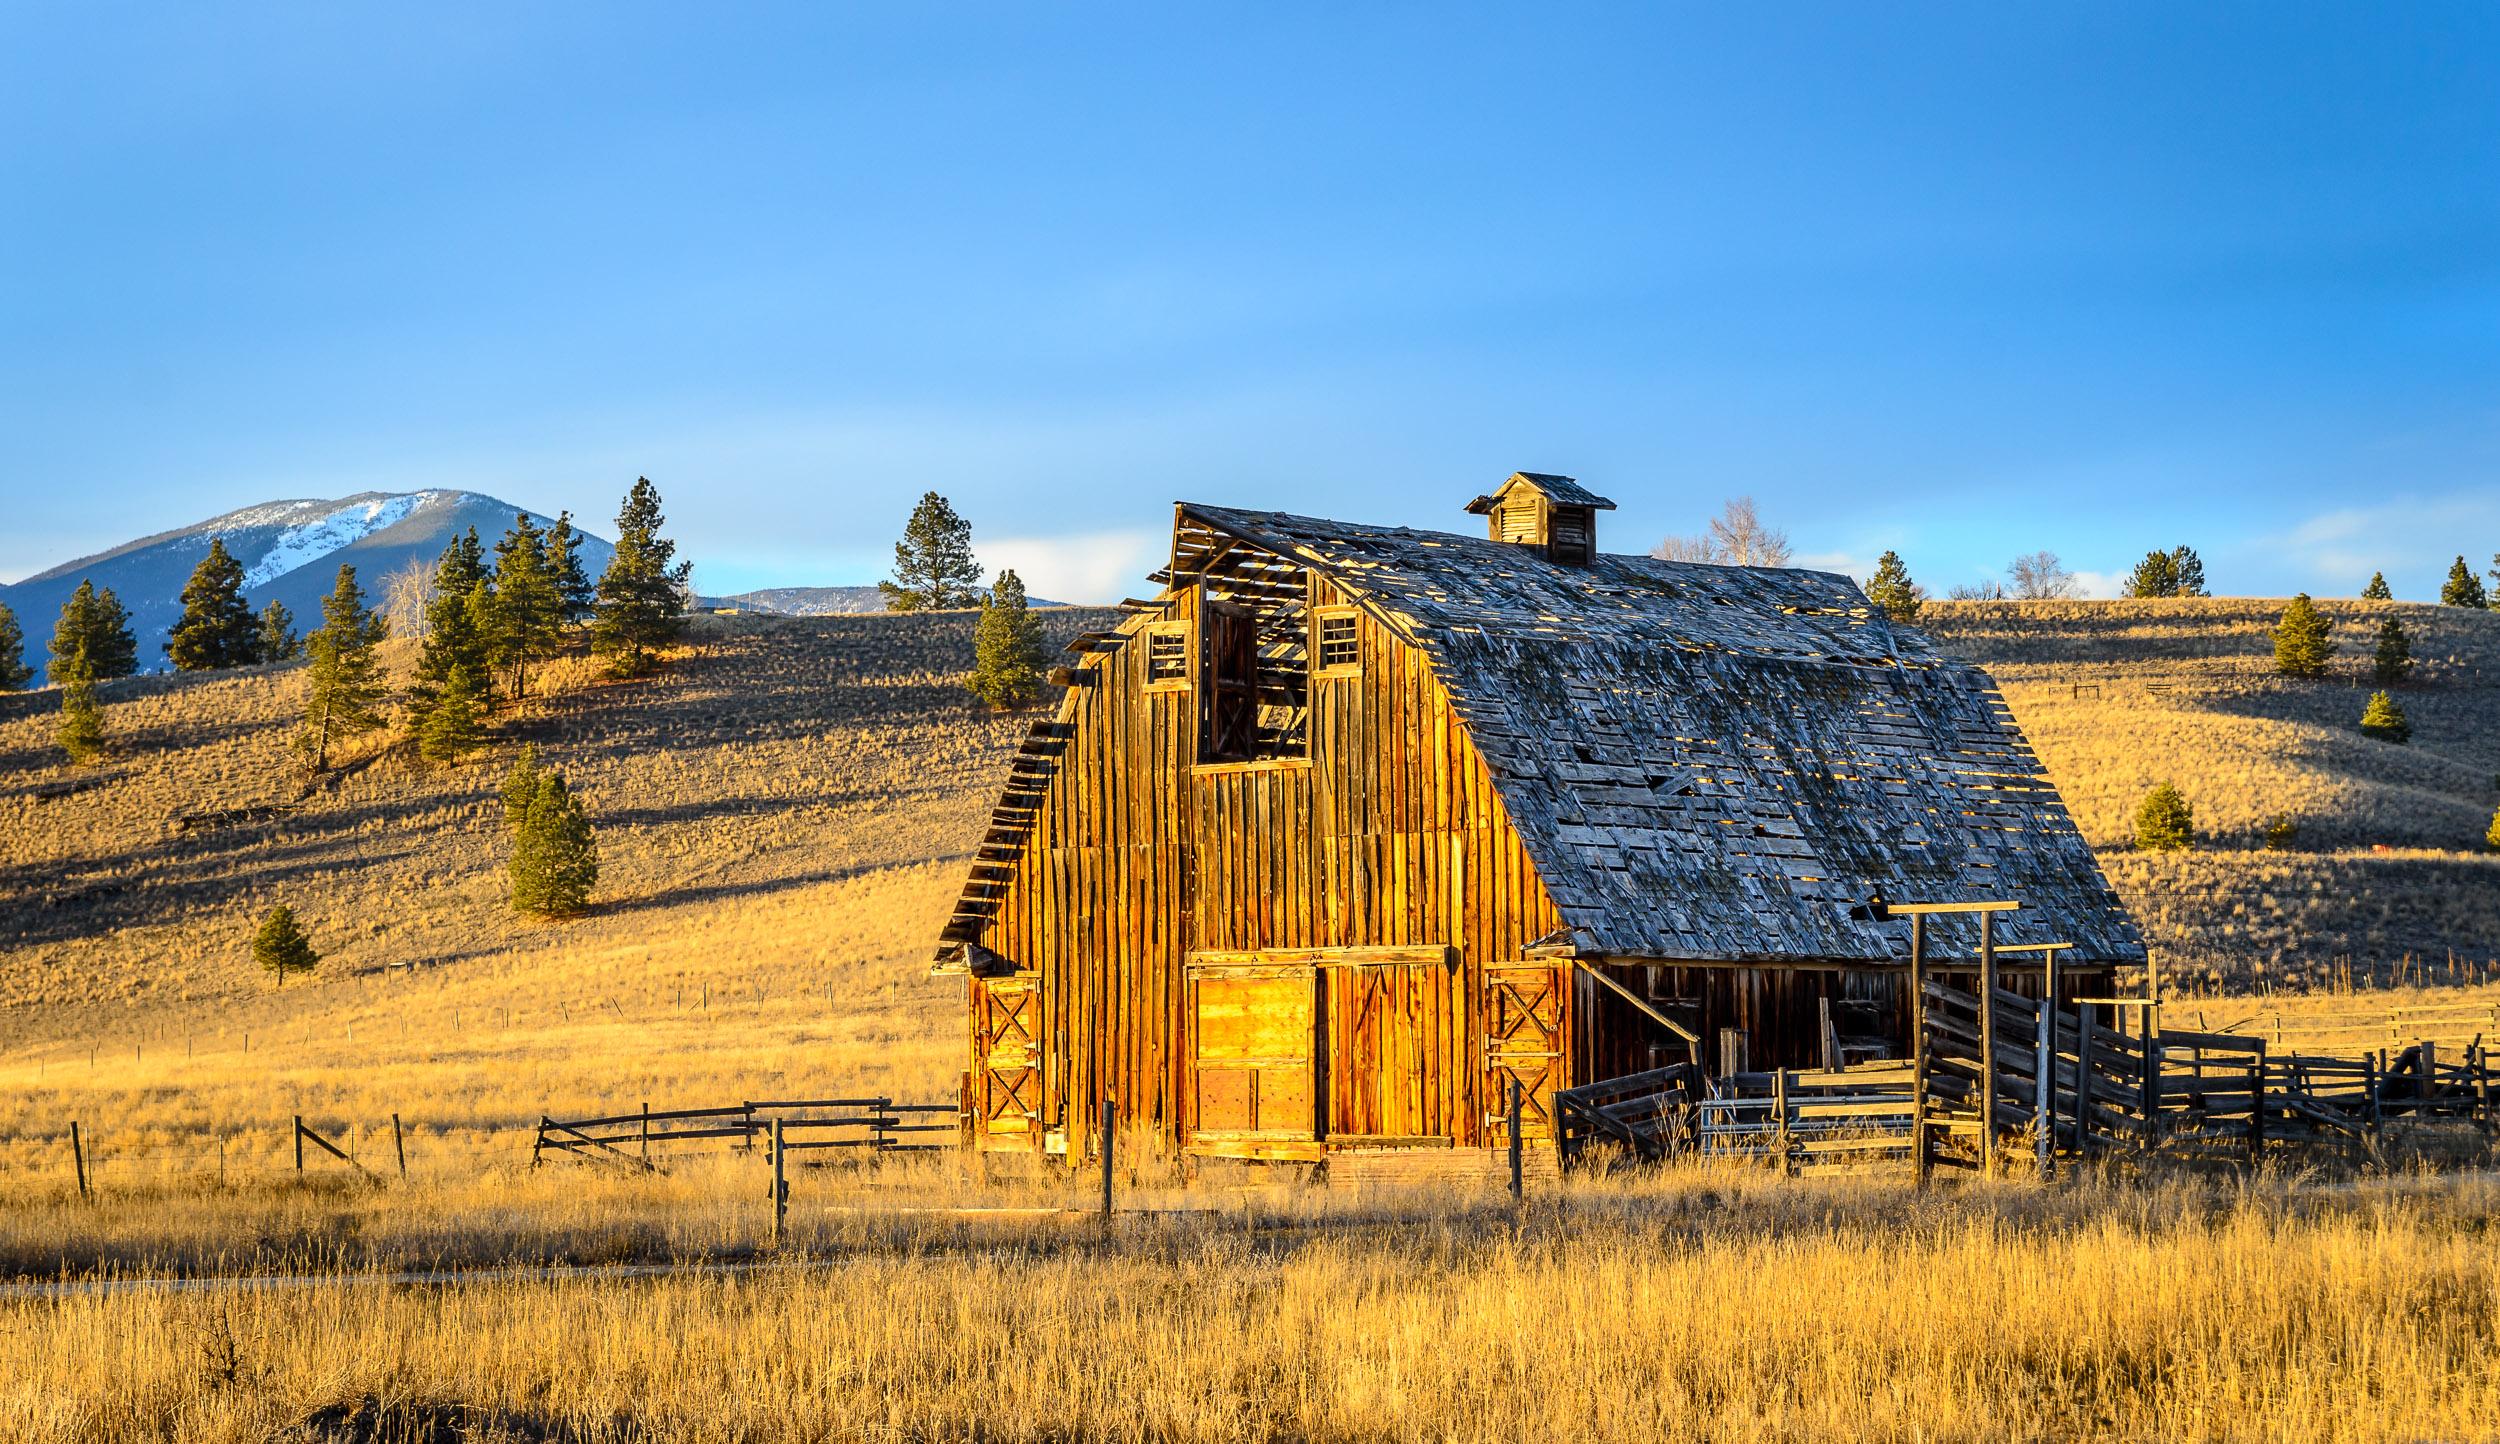 Bitterroot Valley Barn